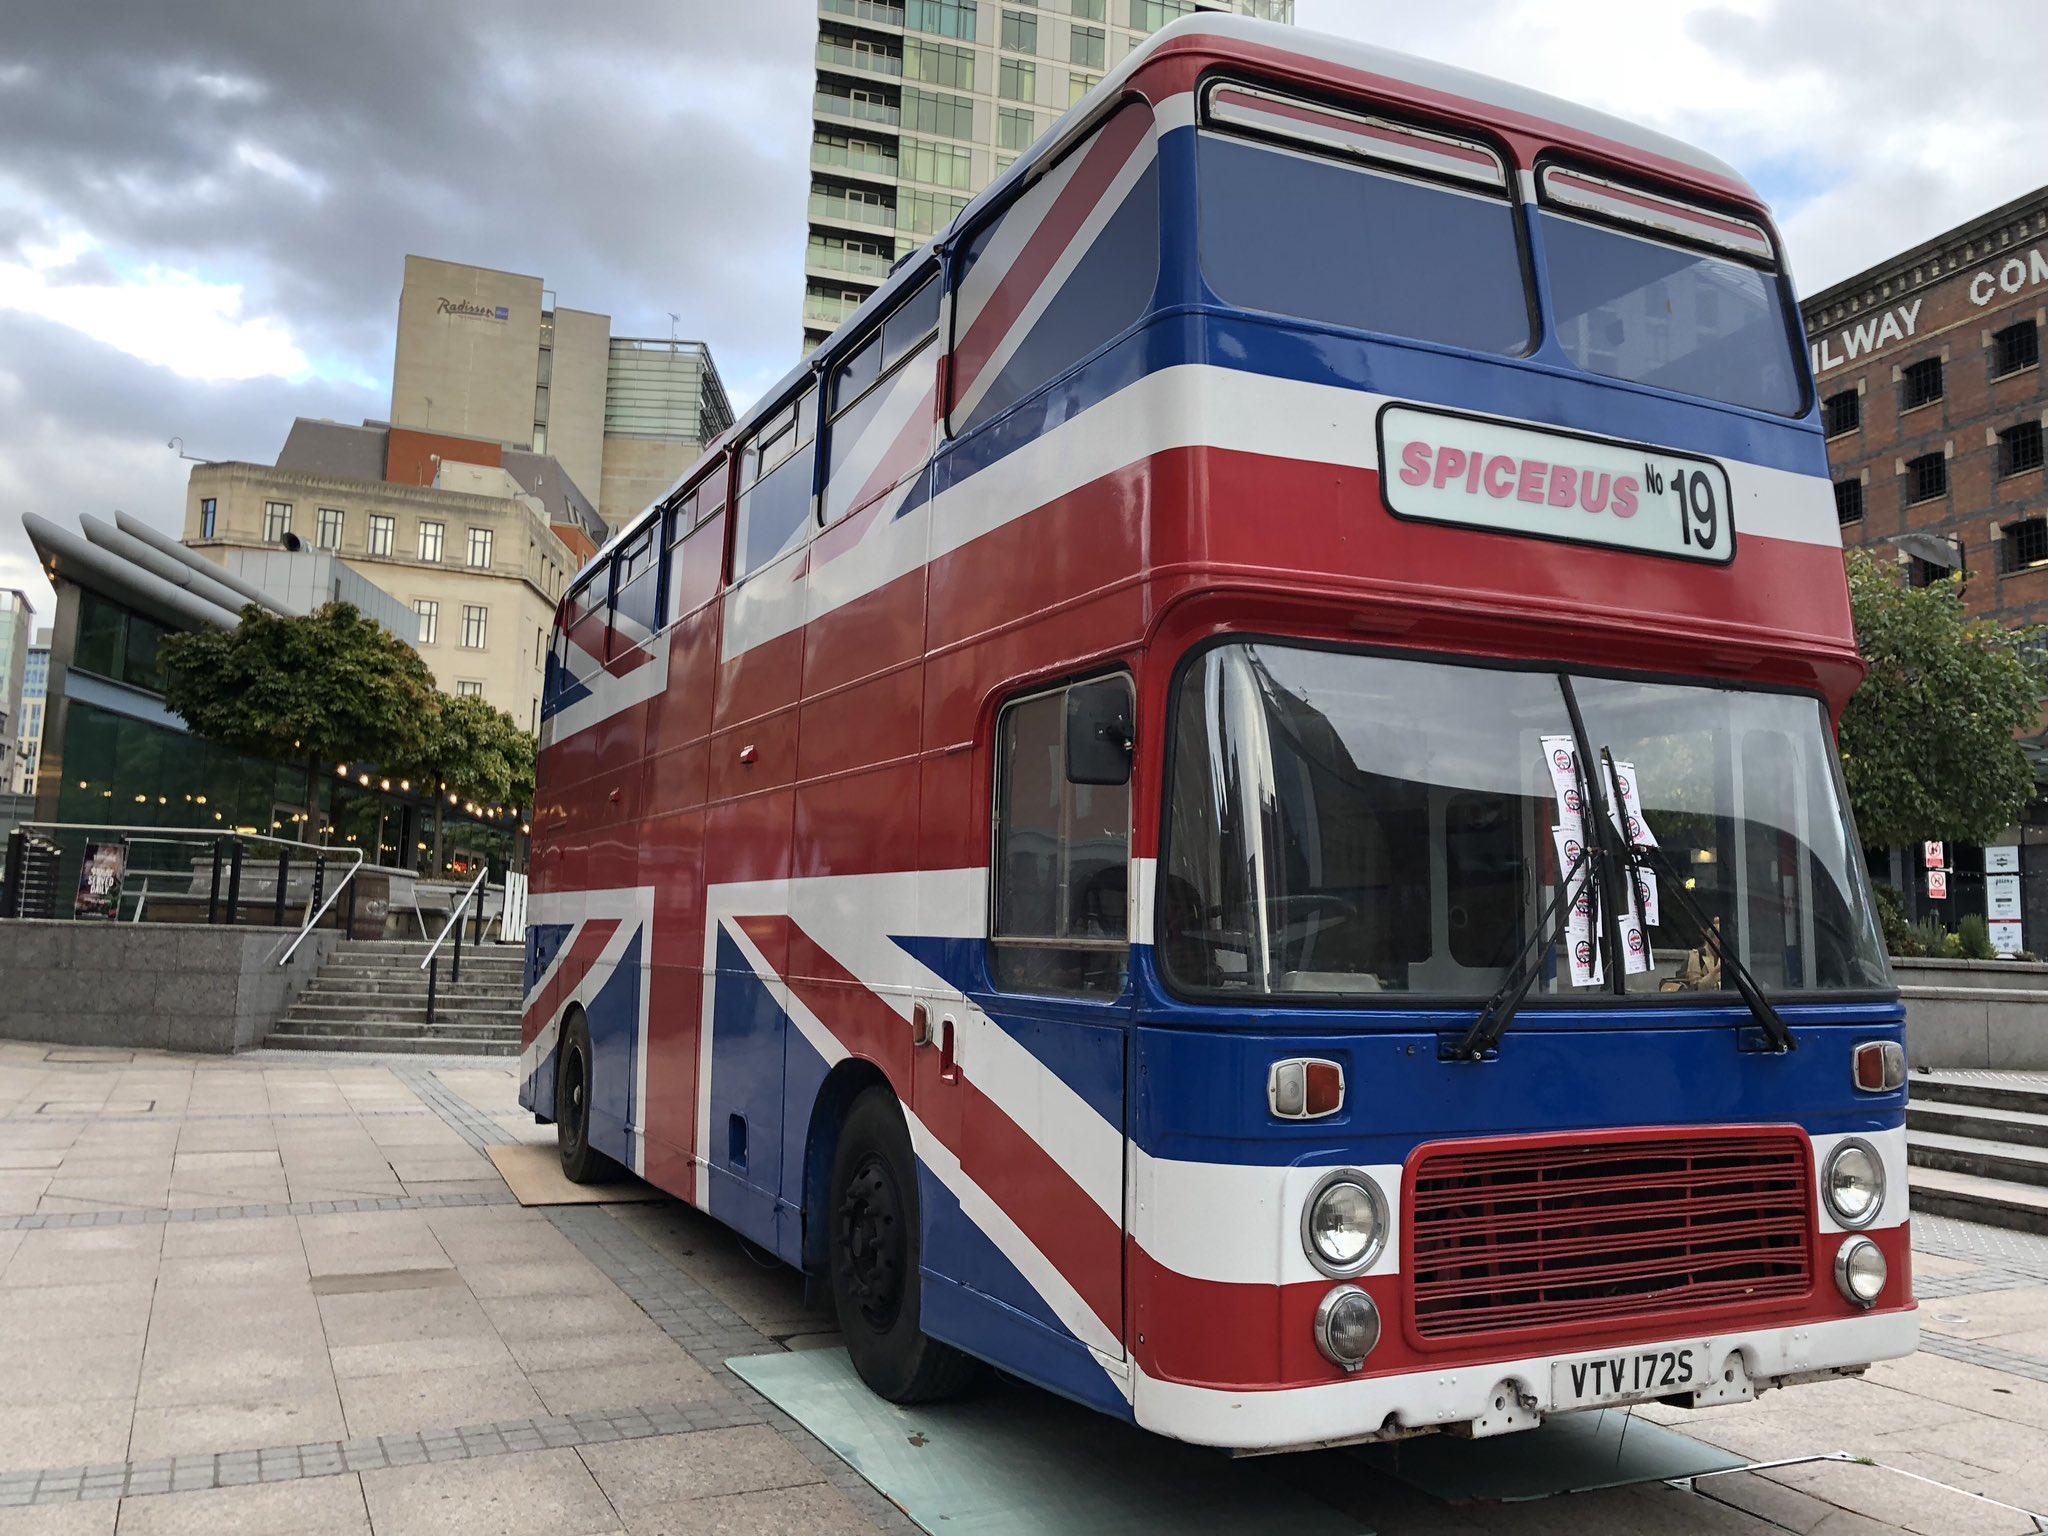 Spice Girls Exhibition Extends Manchester Tour